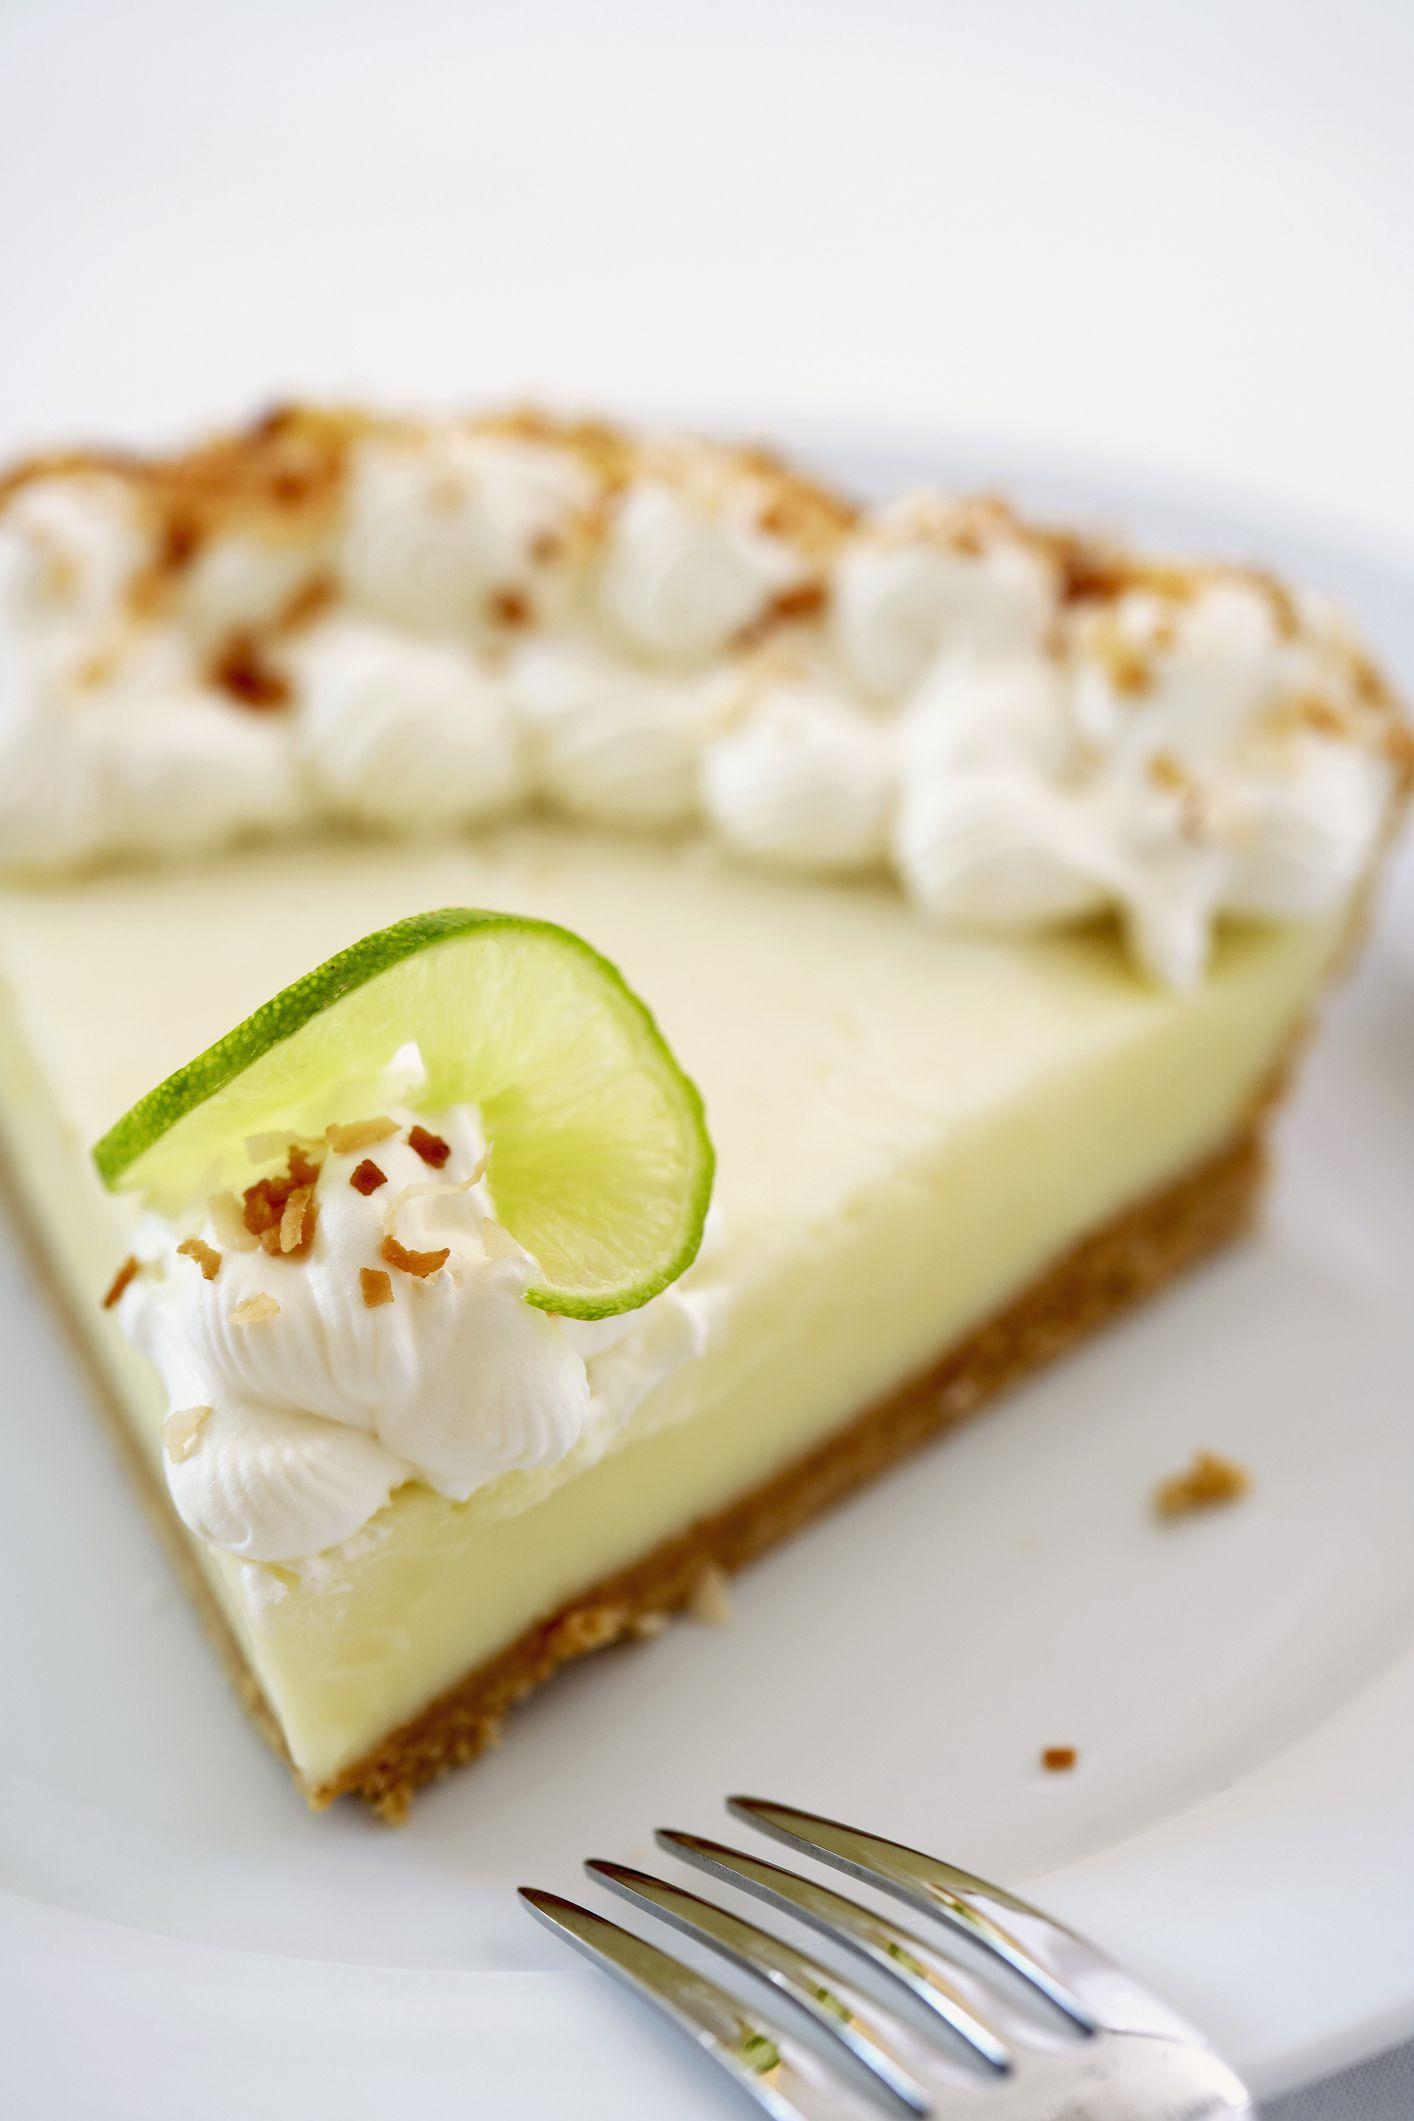 Slice of Key lime pie, close up